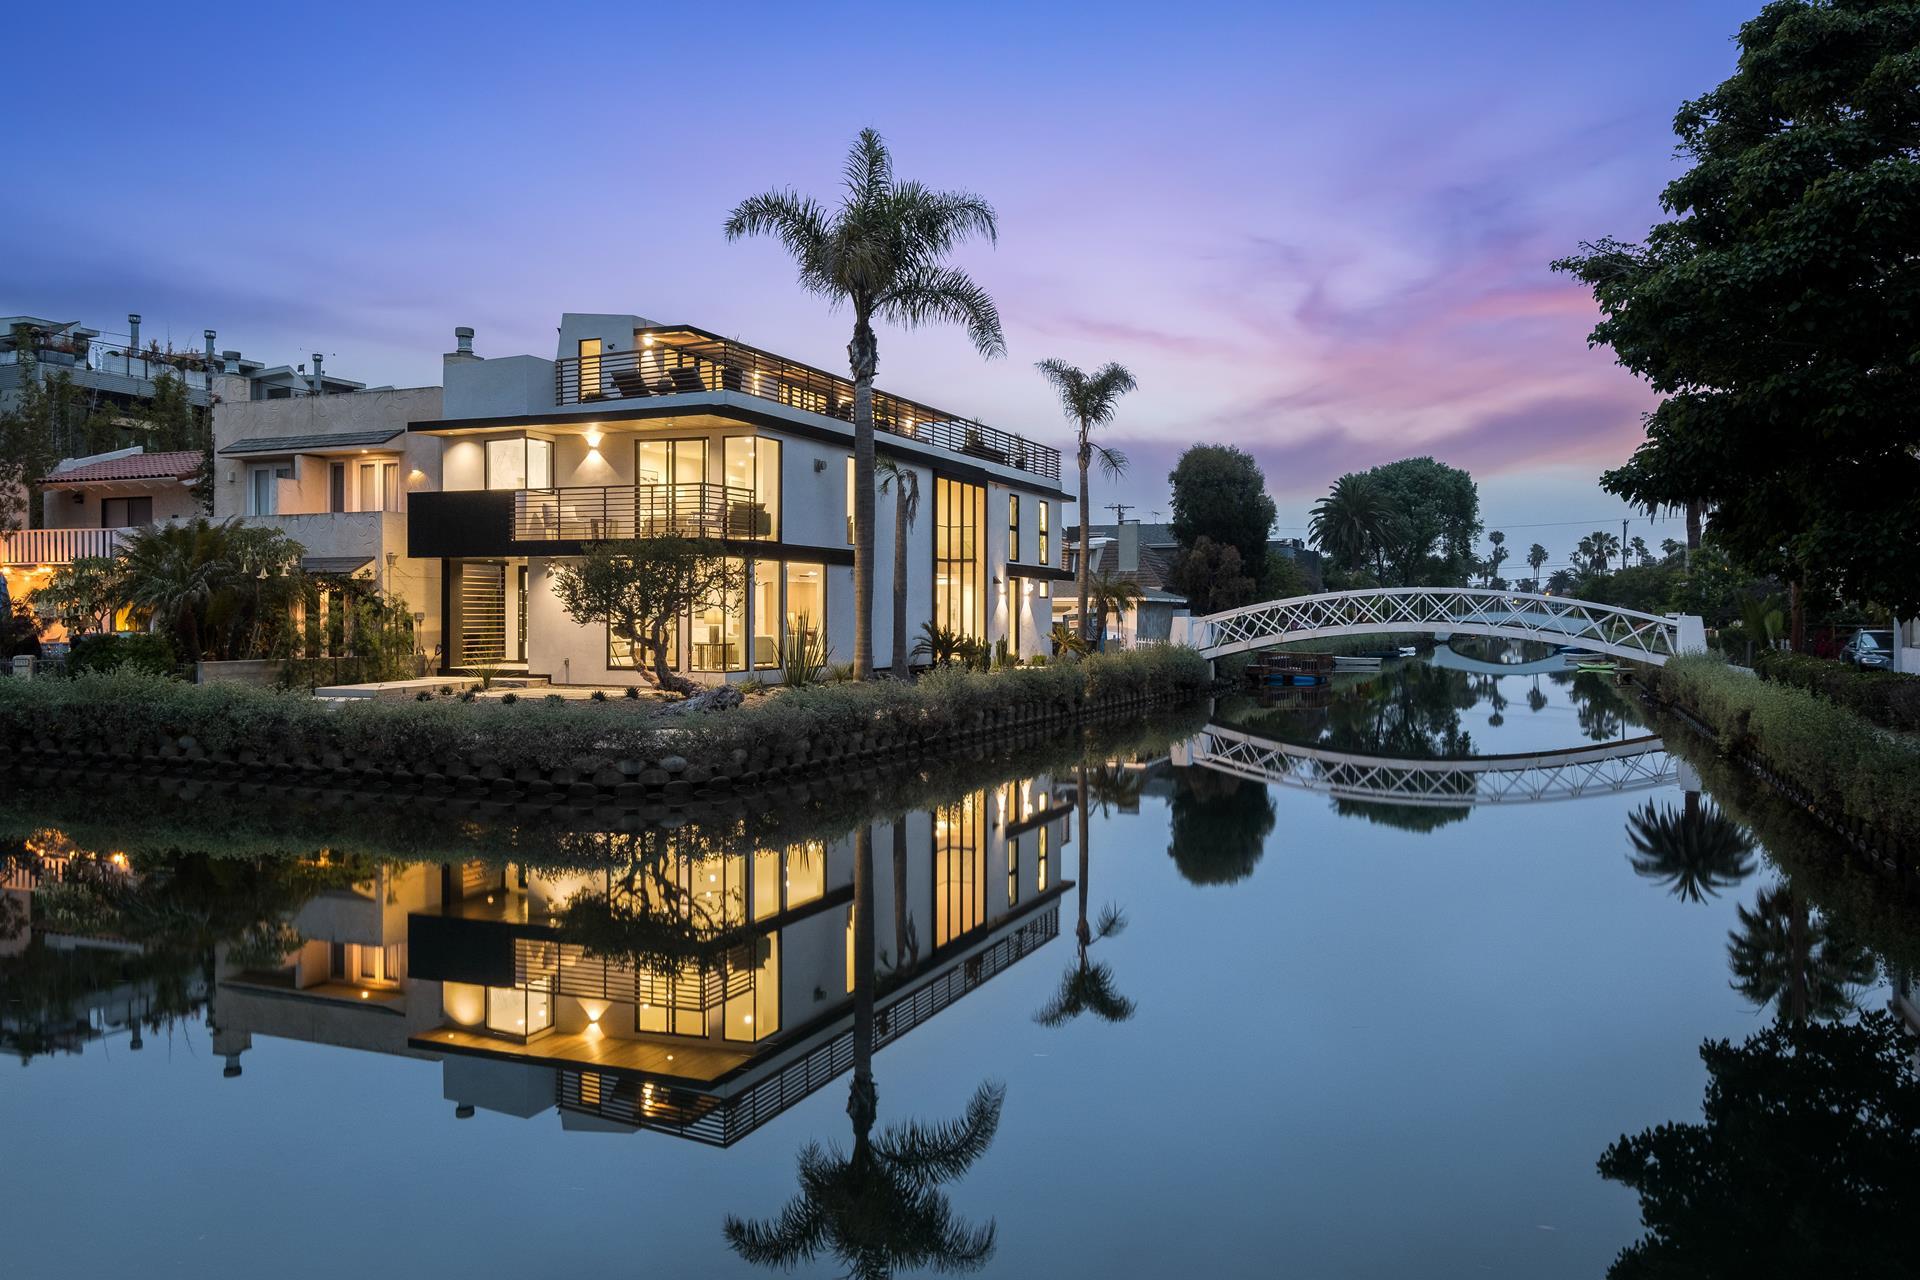 2218 GRAND CANAL - Venice, California